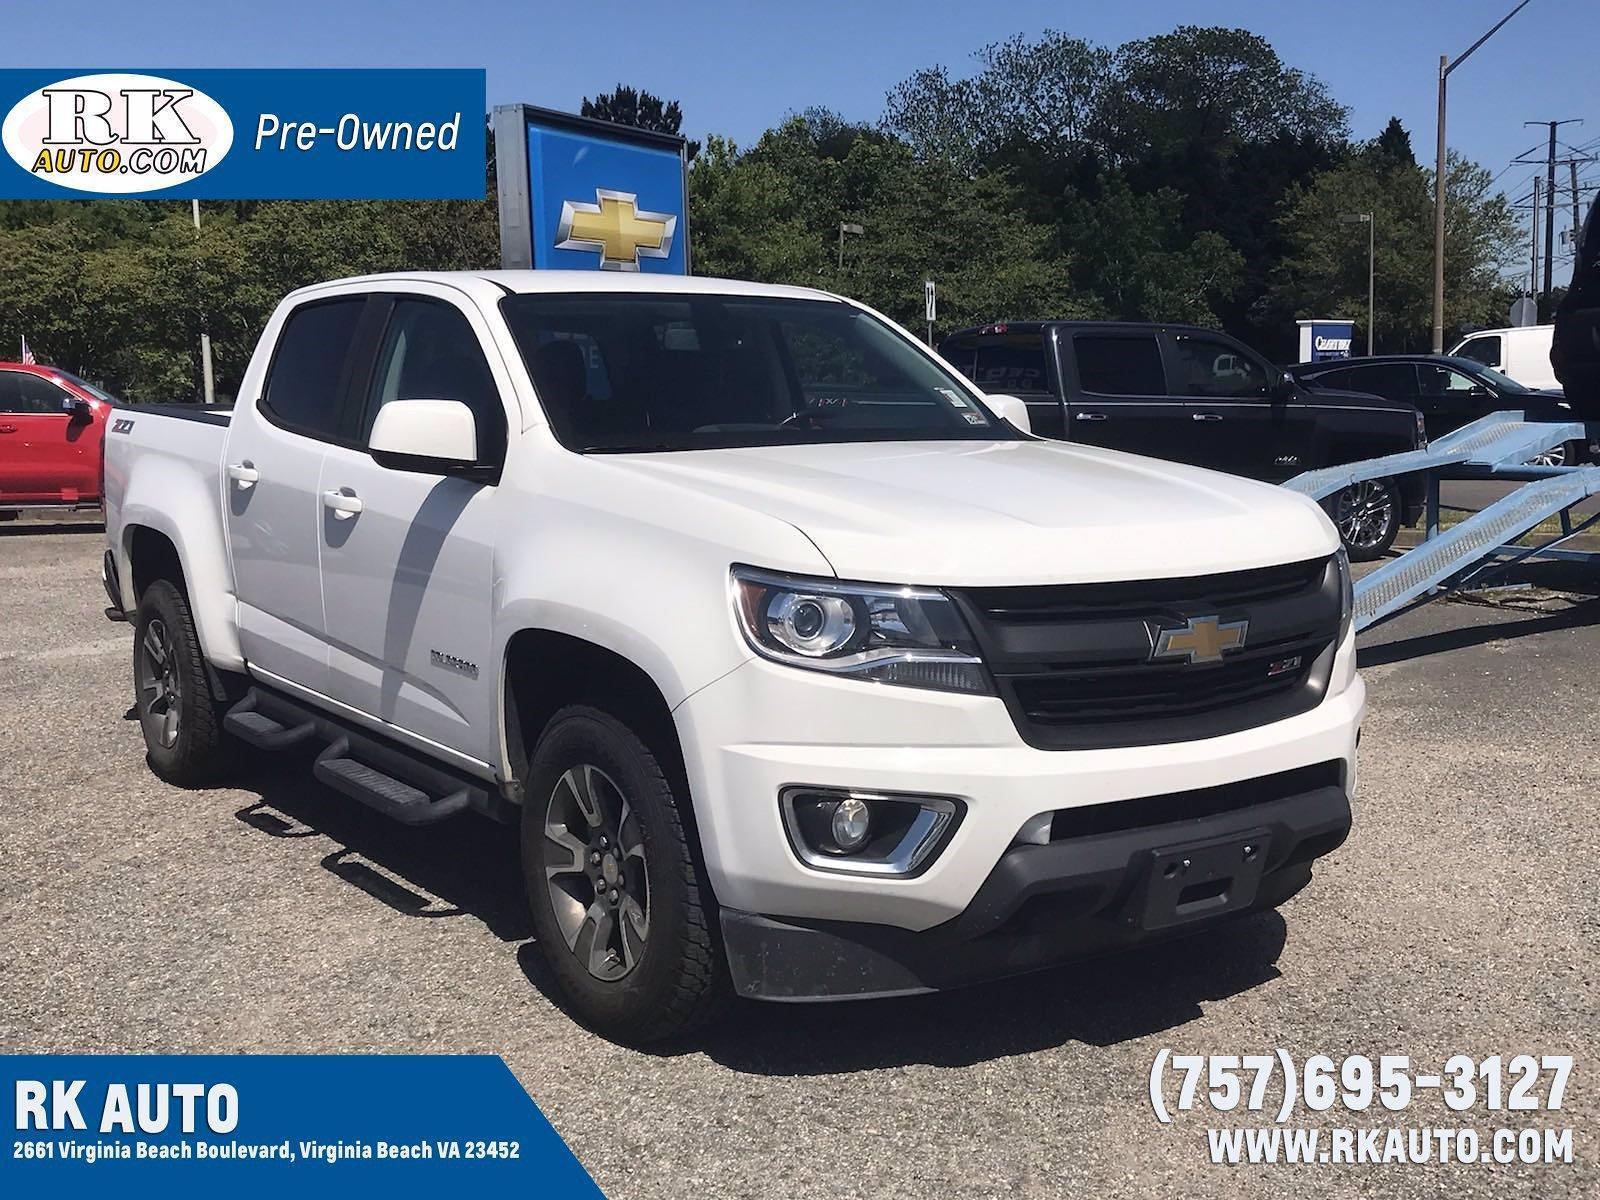 2020 Chevrolet Colorado Crew Cab 4x4, Pickup #216962A - photo 1